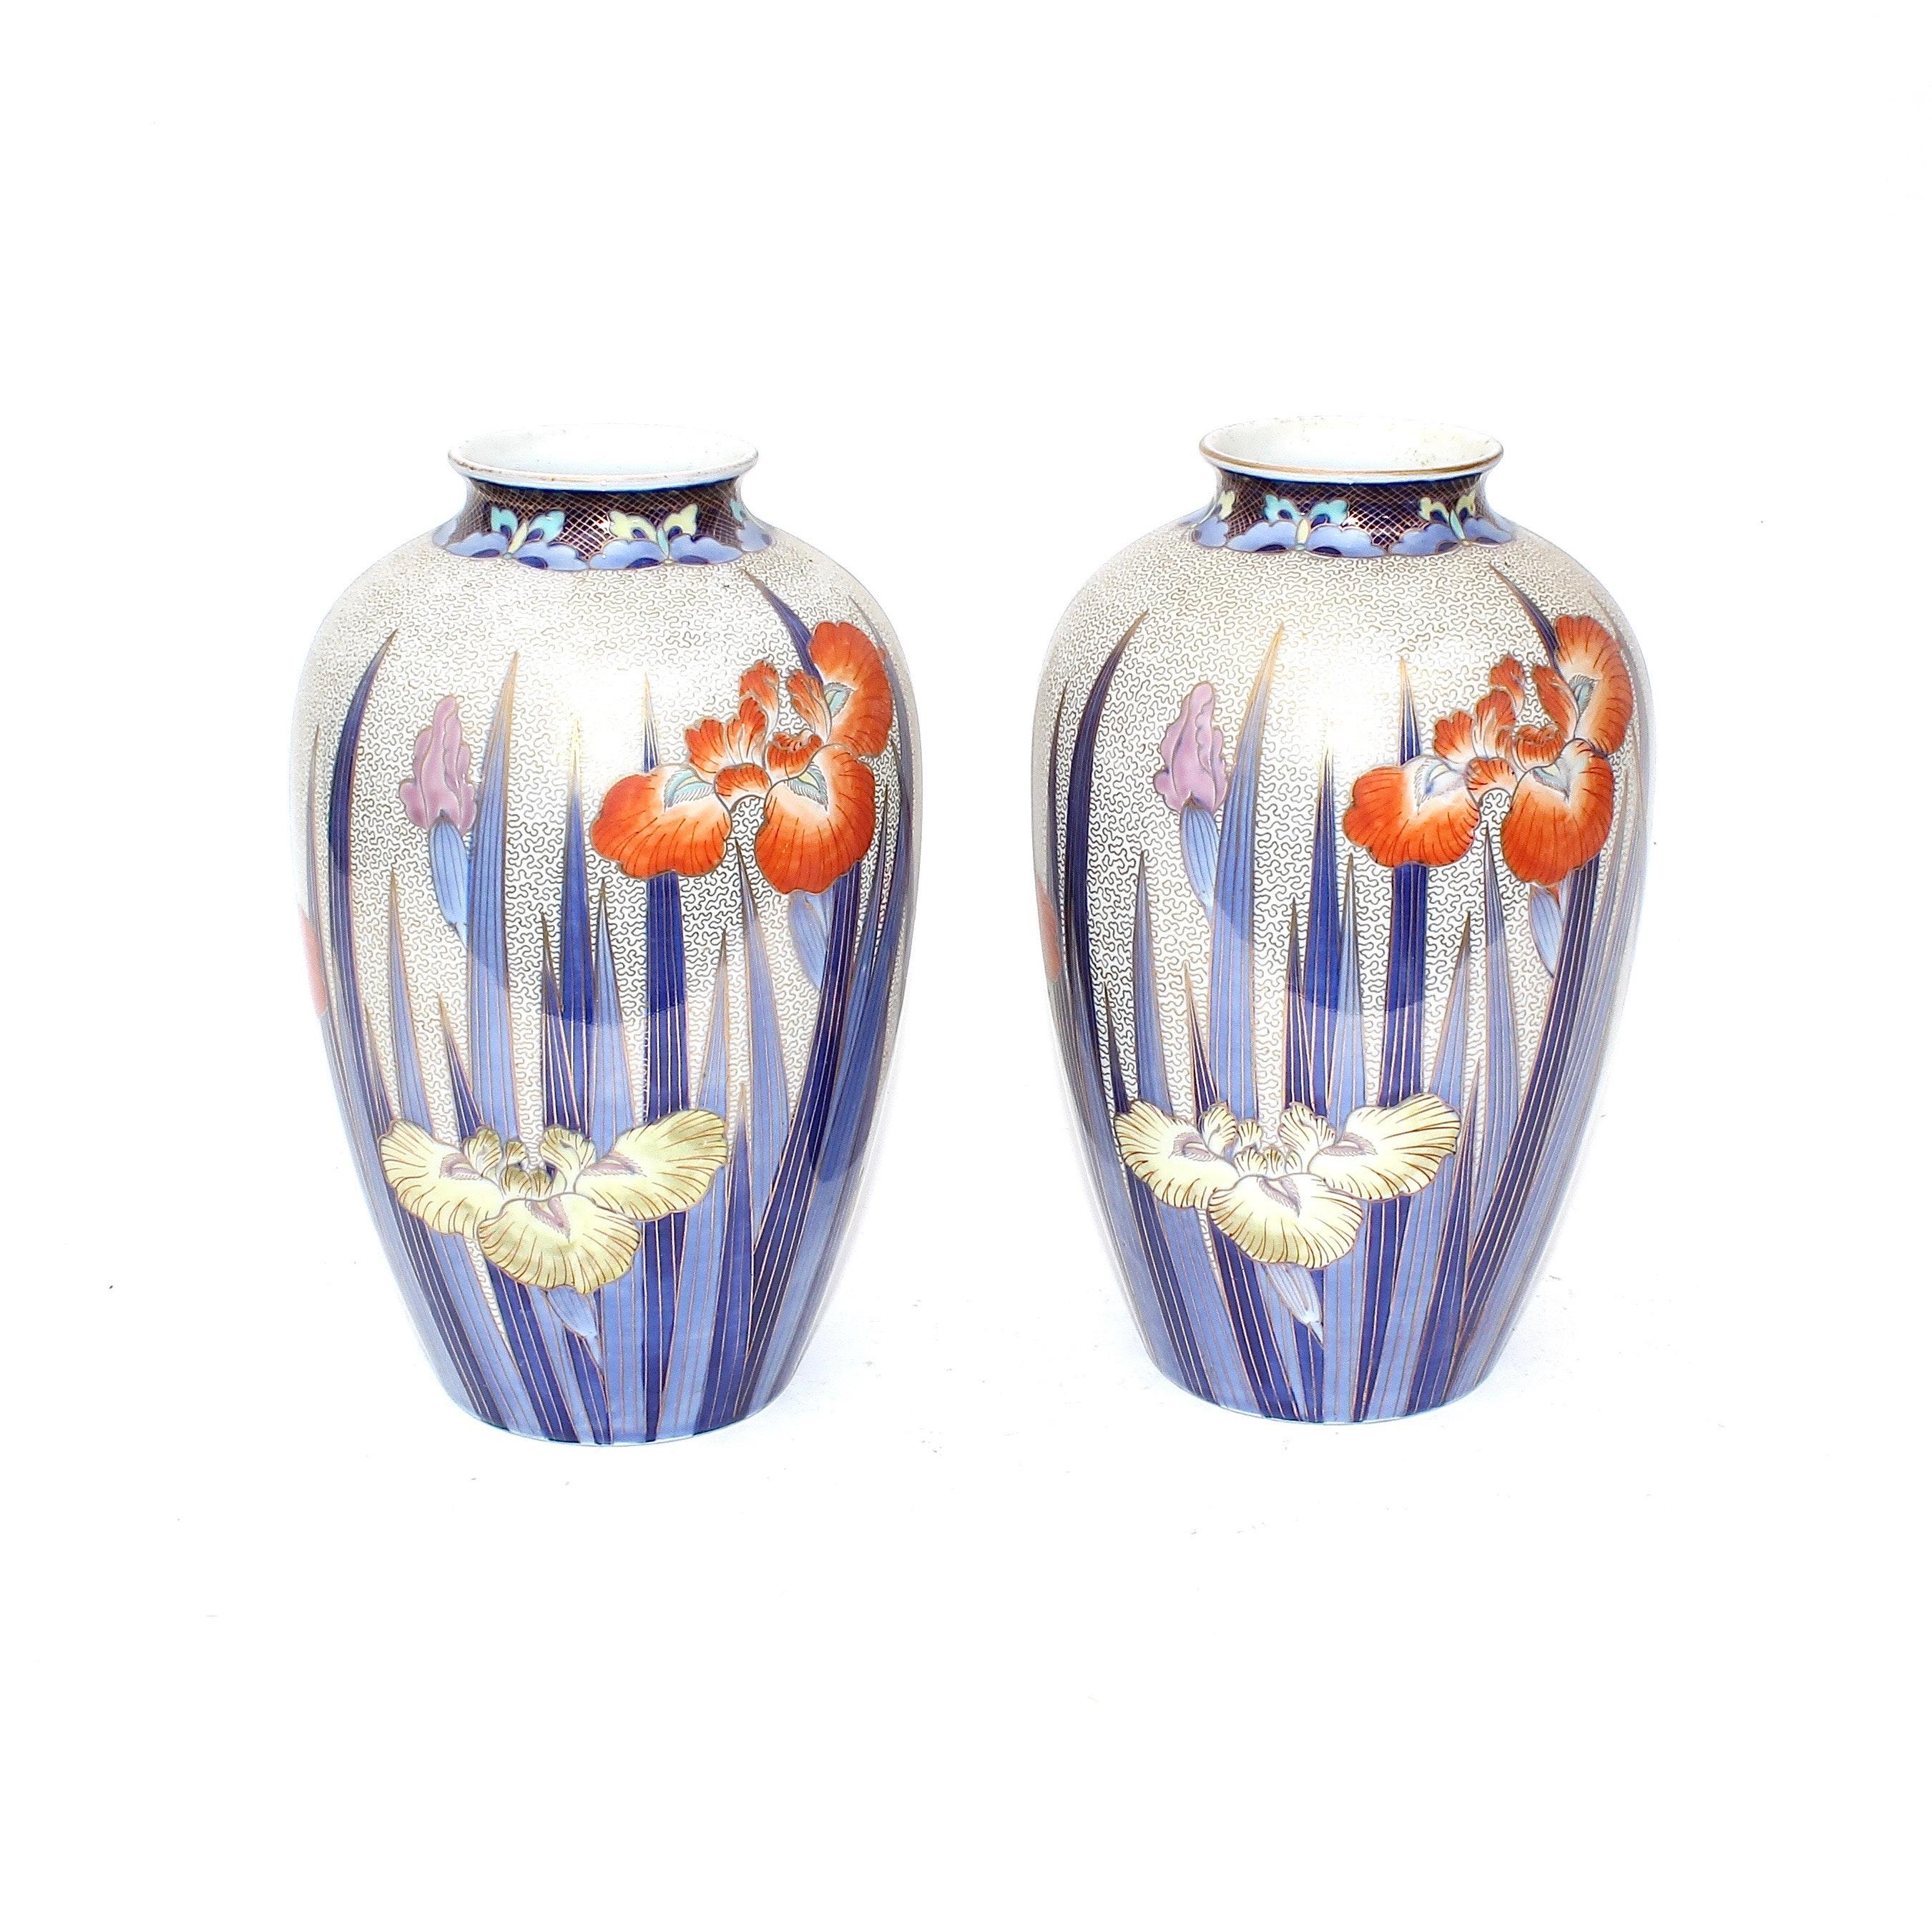 Pair of Japanese Fukagawa Porcelain Floral Vases